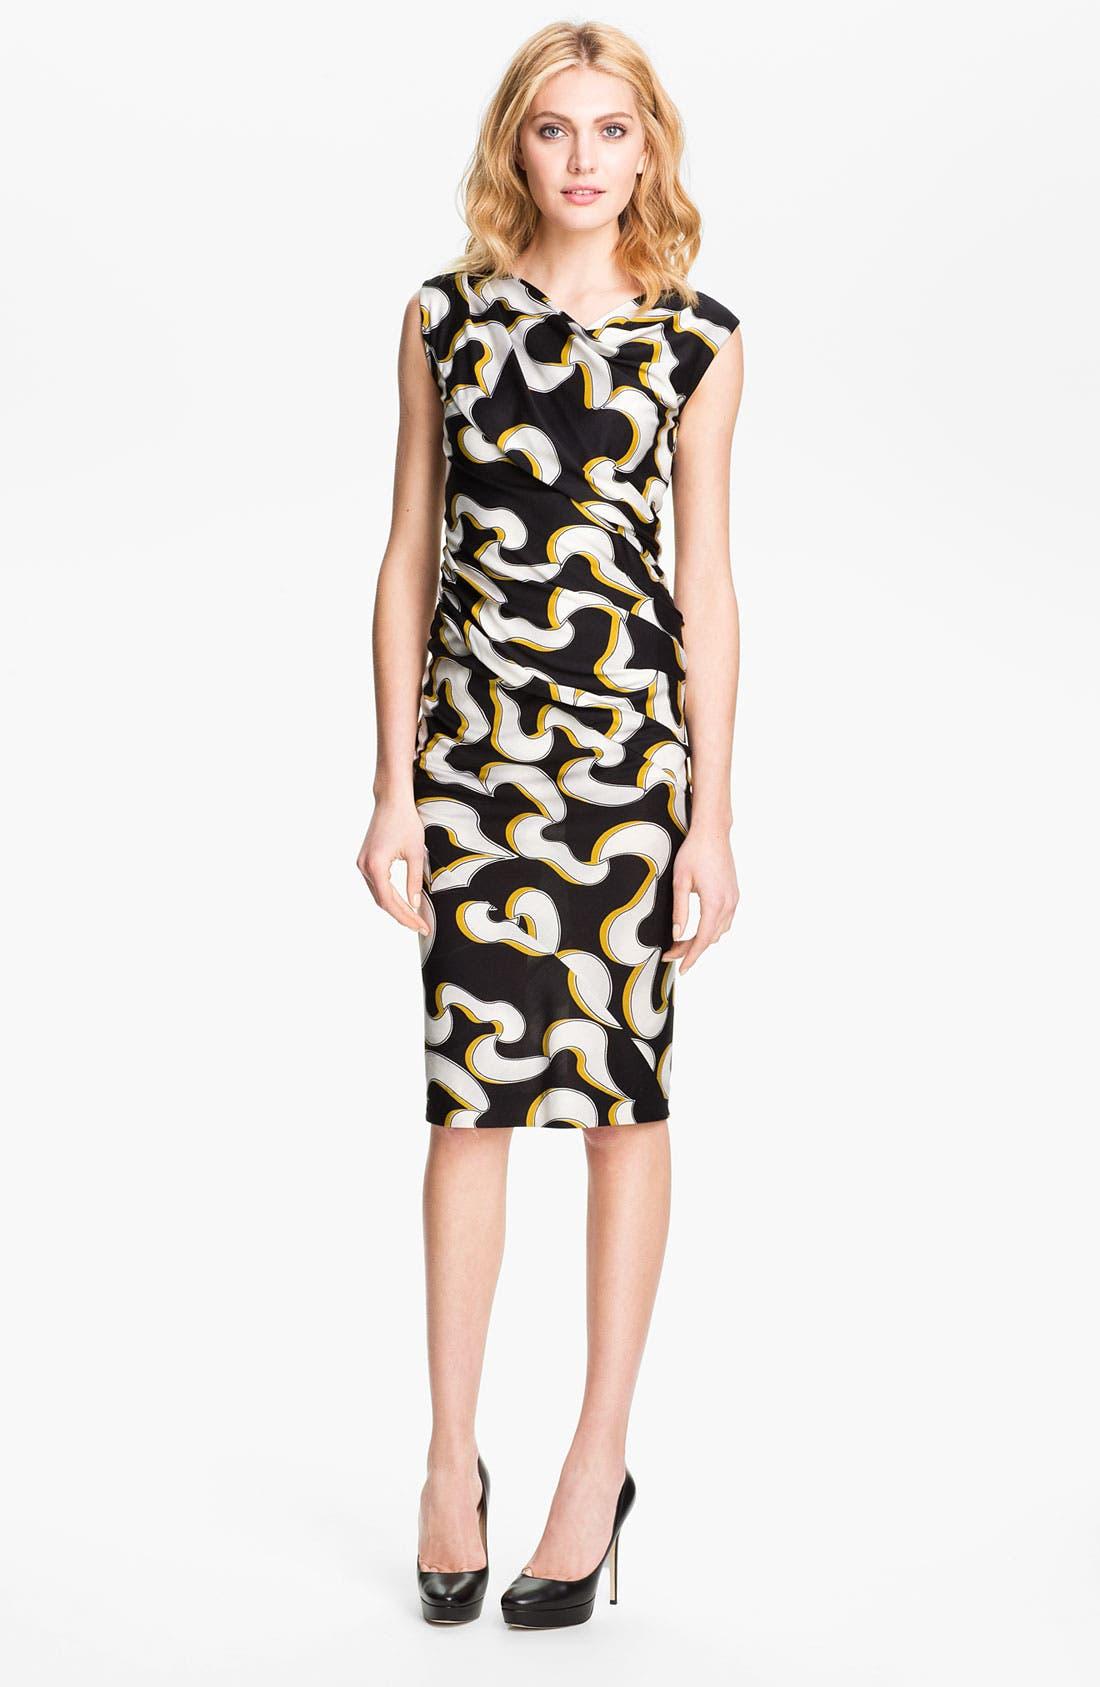 Alternate Image 1 Selected - Diane von Furstenberg 'Luisa' Silk Jersey Sheath Dress